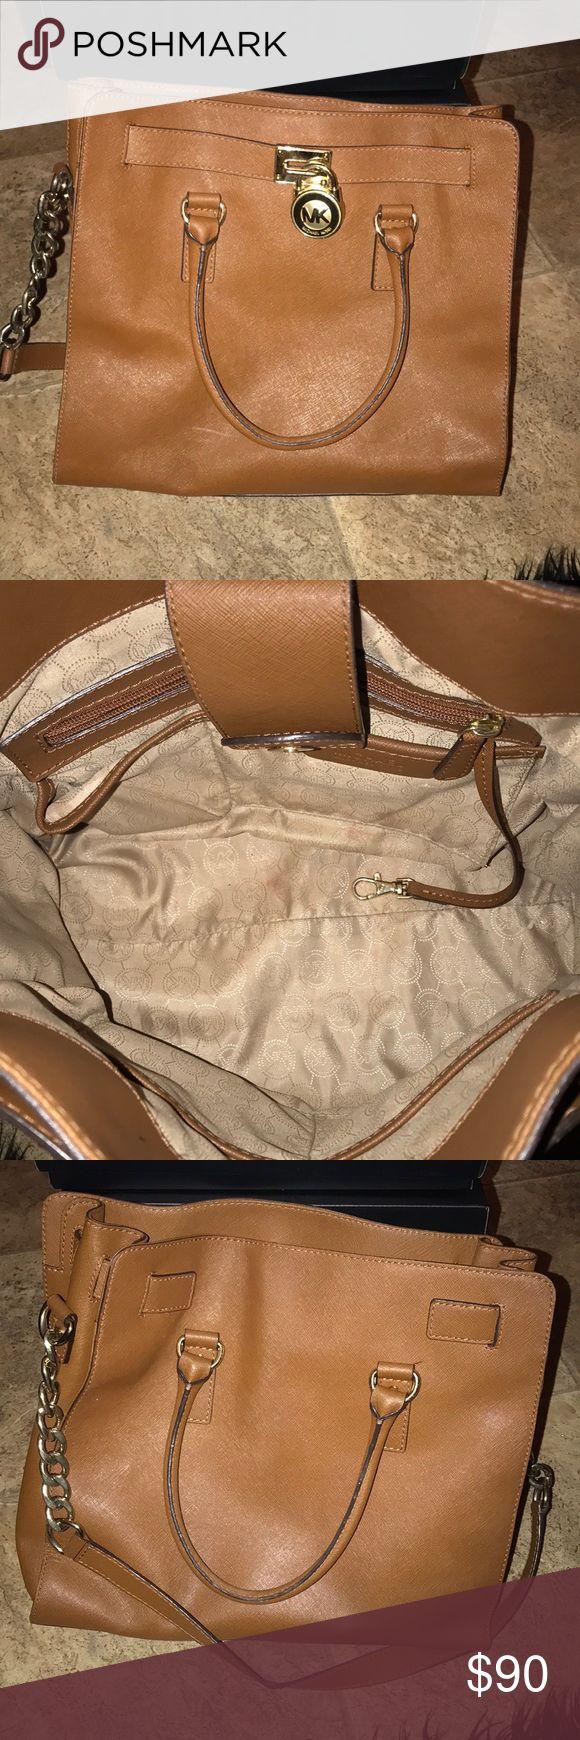 Michael Kors Michael Kors Hamilton handbag Michael Kors Bags Shoulder Bags